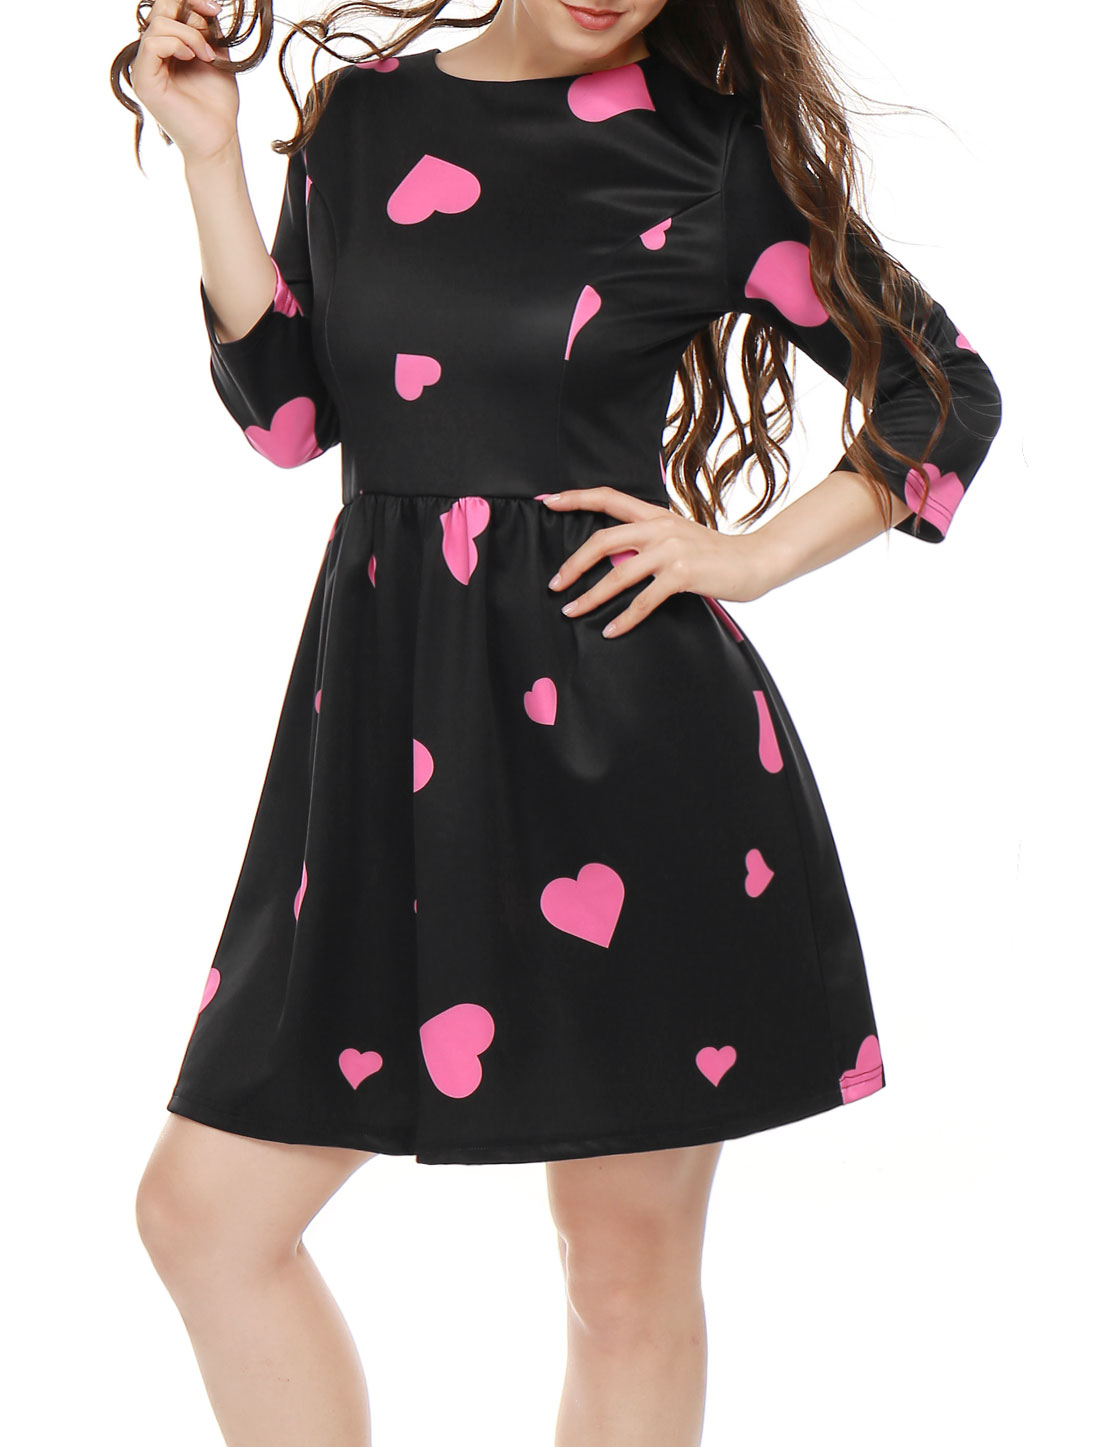 Women Crew Neck 3/4 Sleeves Heart Prints Flare Dress Black S